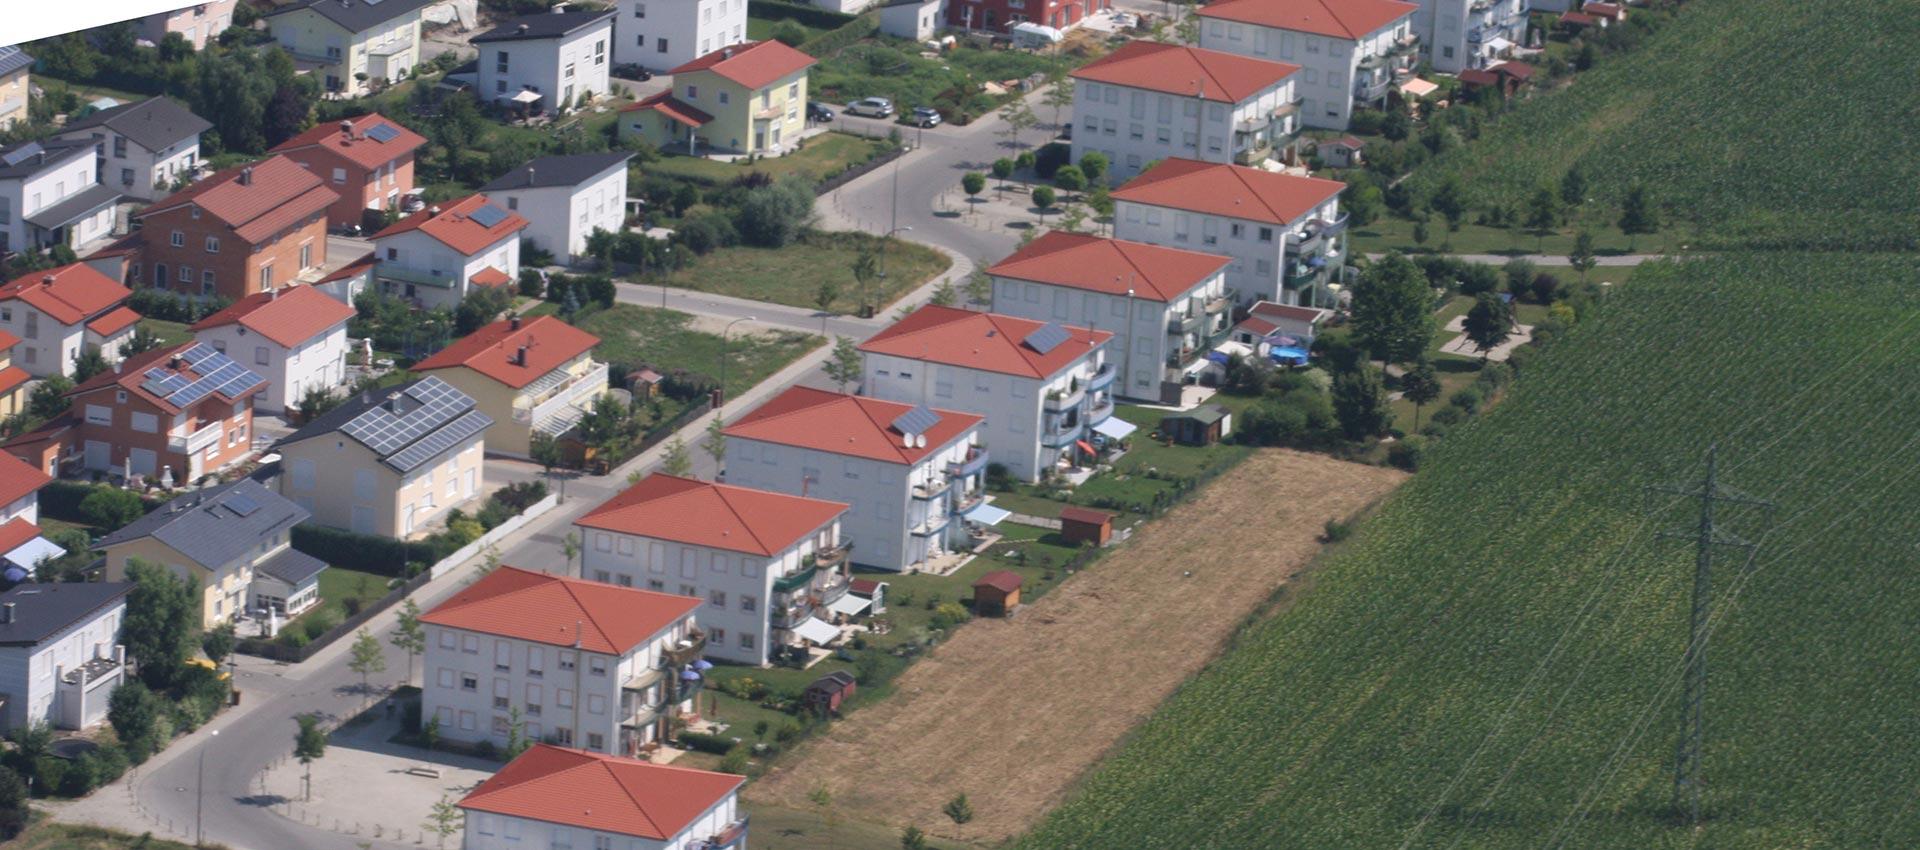 Brandl GmbH in Pfeffenhausen